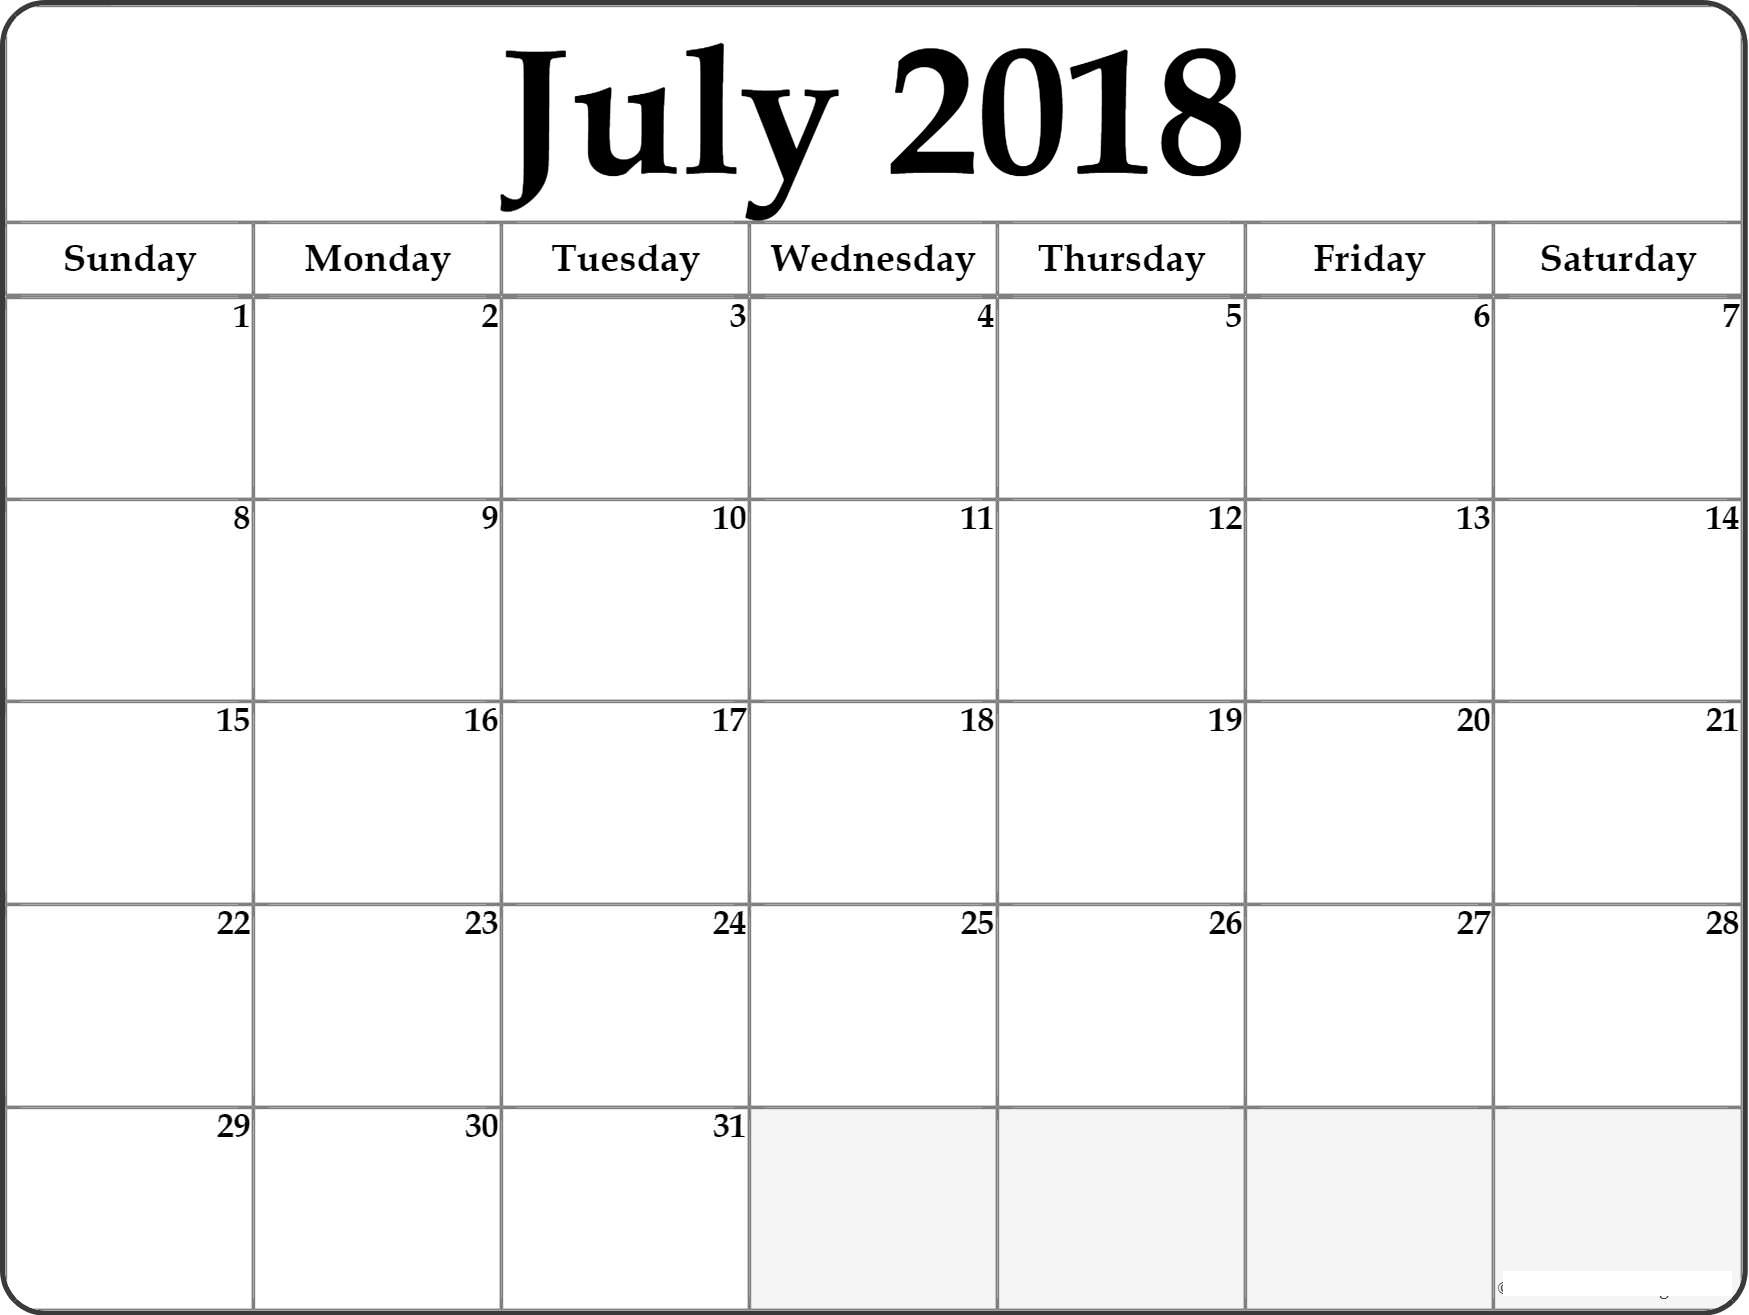 July 2018 Calendar Pdf